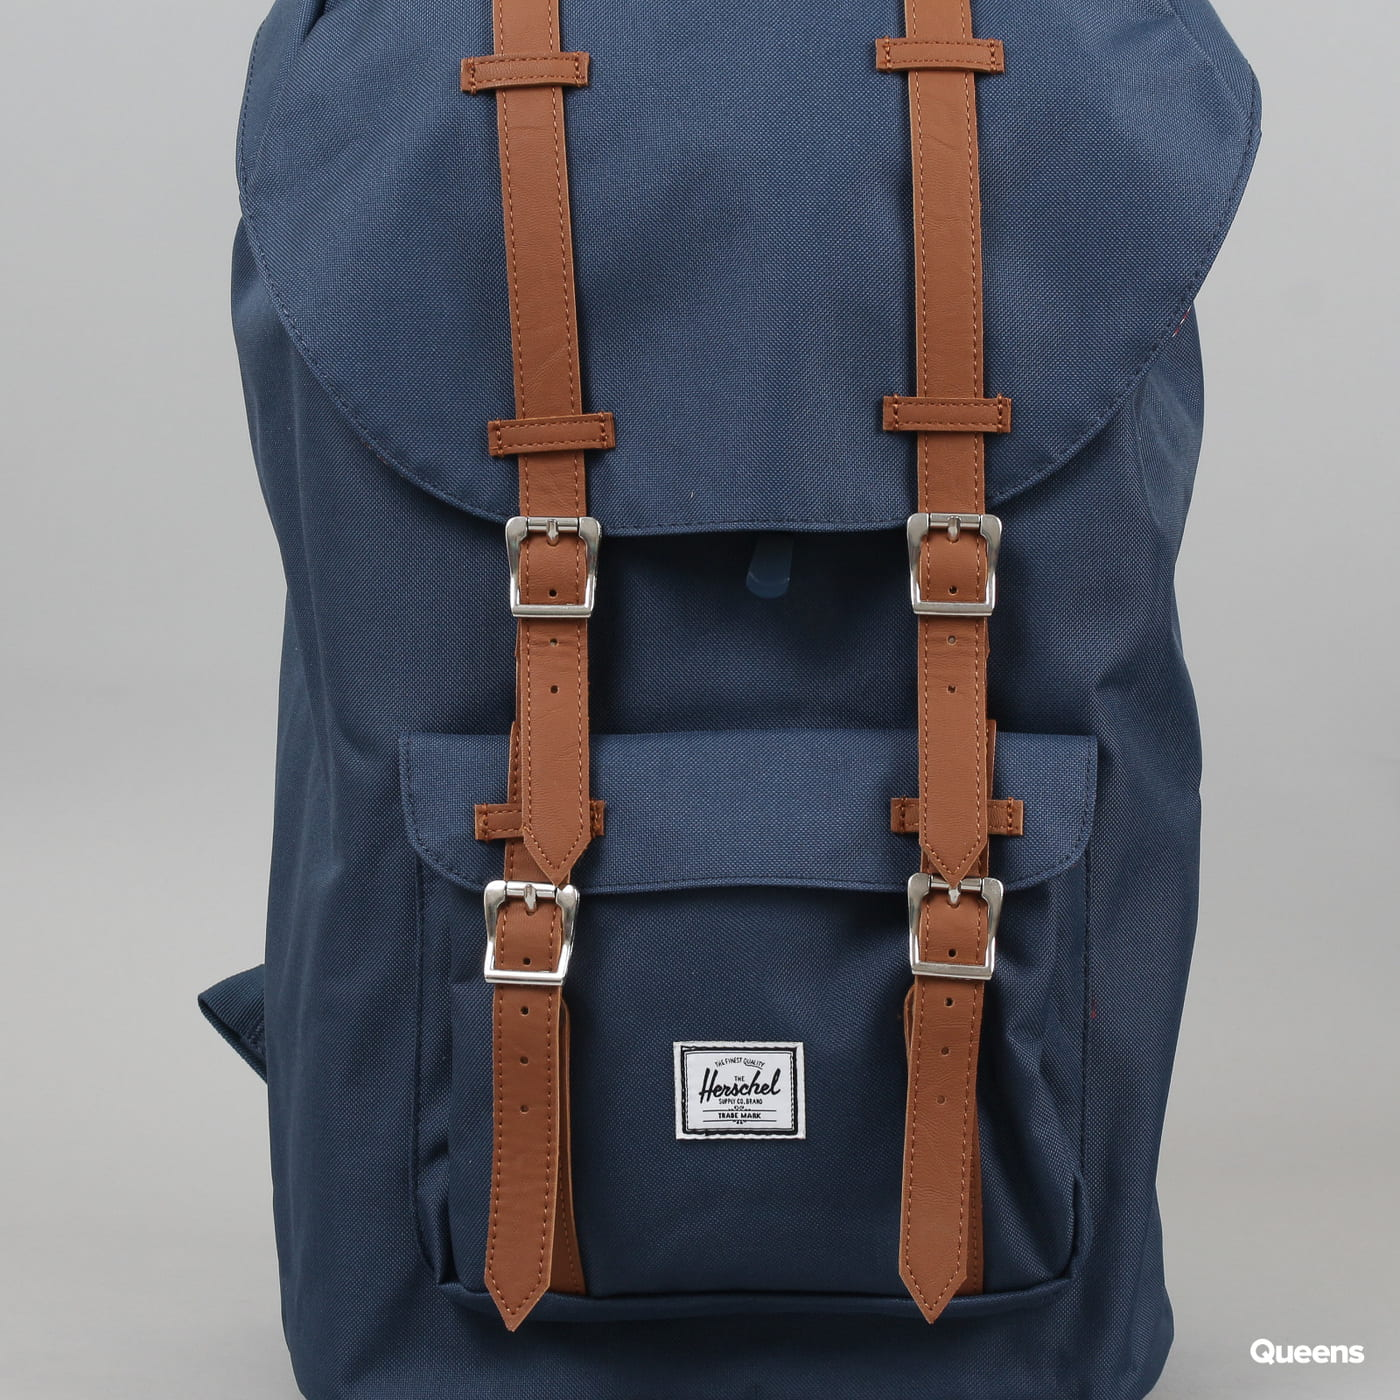 The Herschel Supply CO. Little America Backpack navy / brown